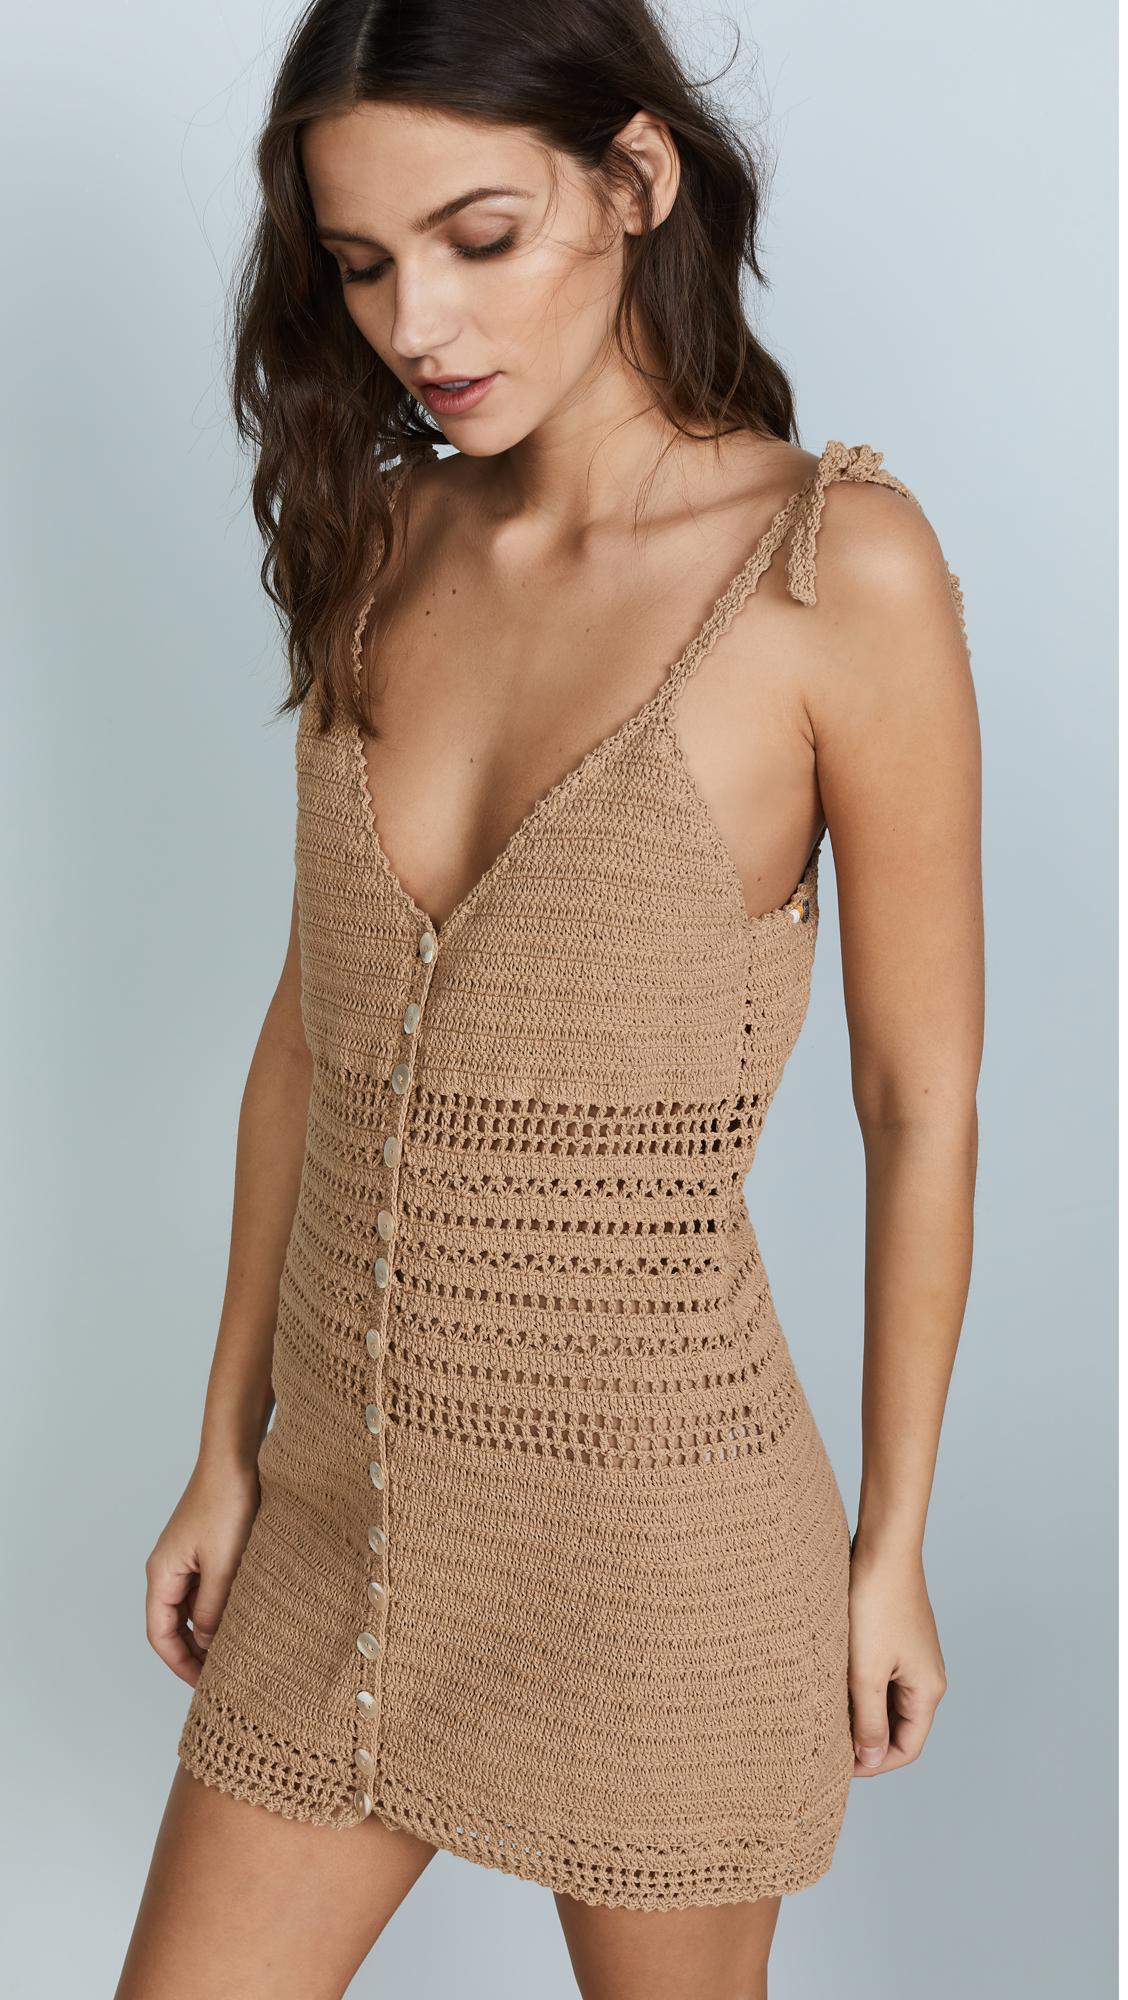 Sita crocheted cotton dress She Made Me tPvj23nxWj